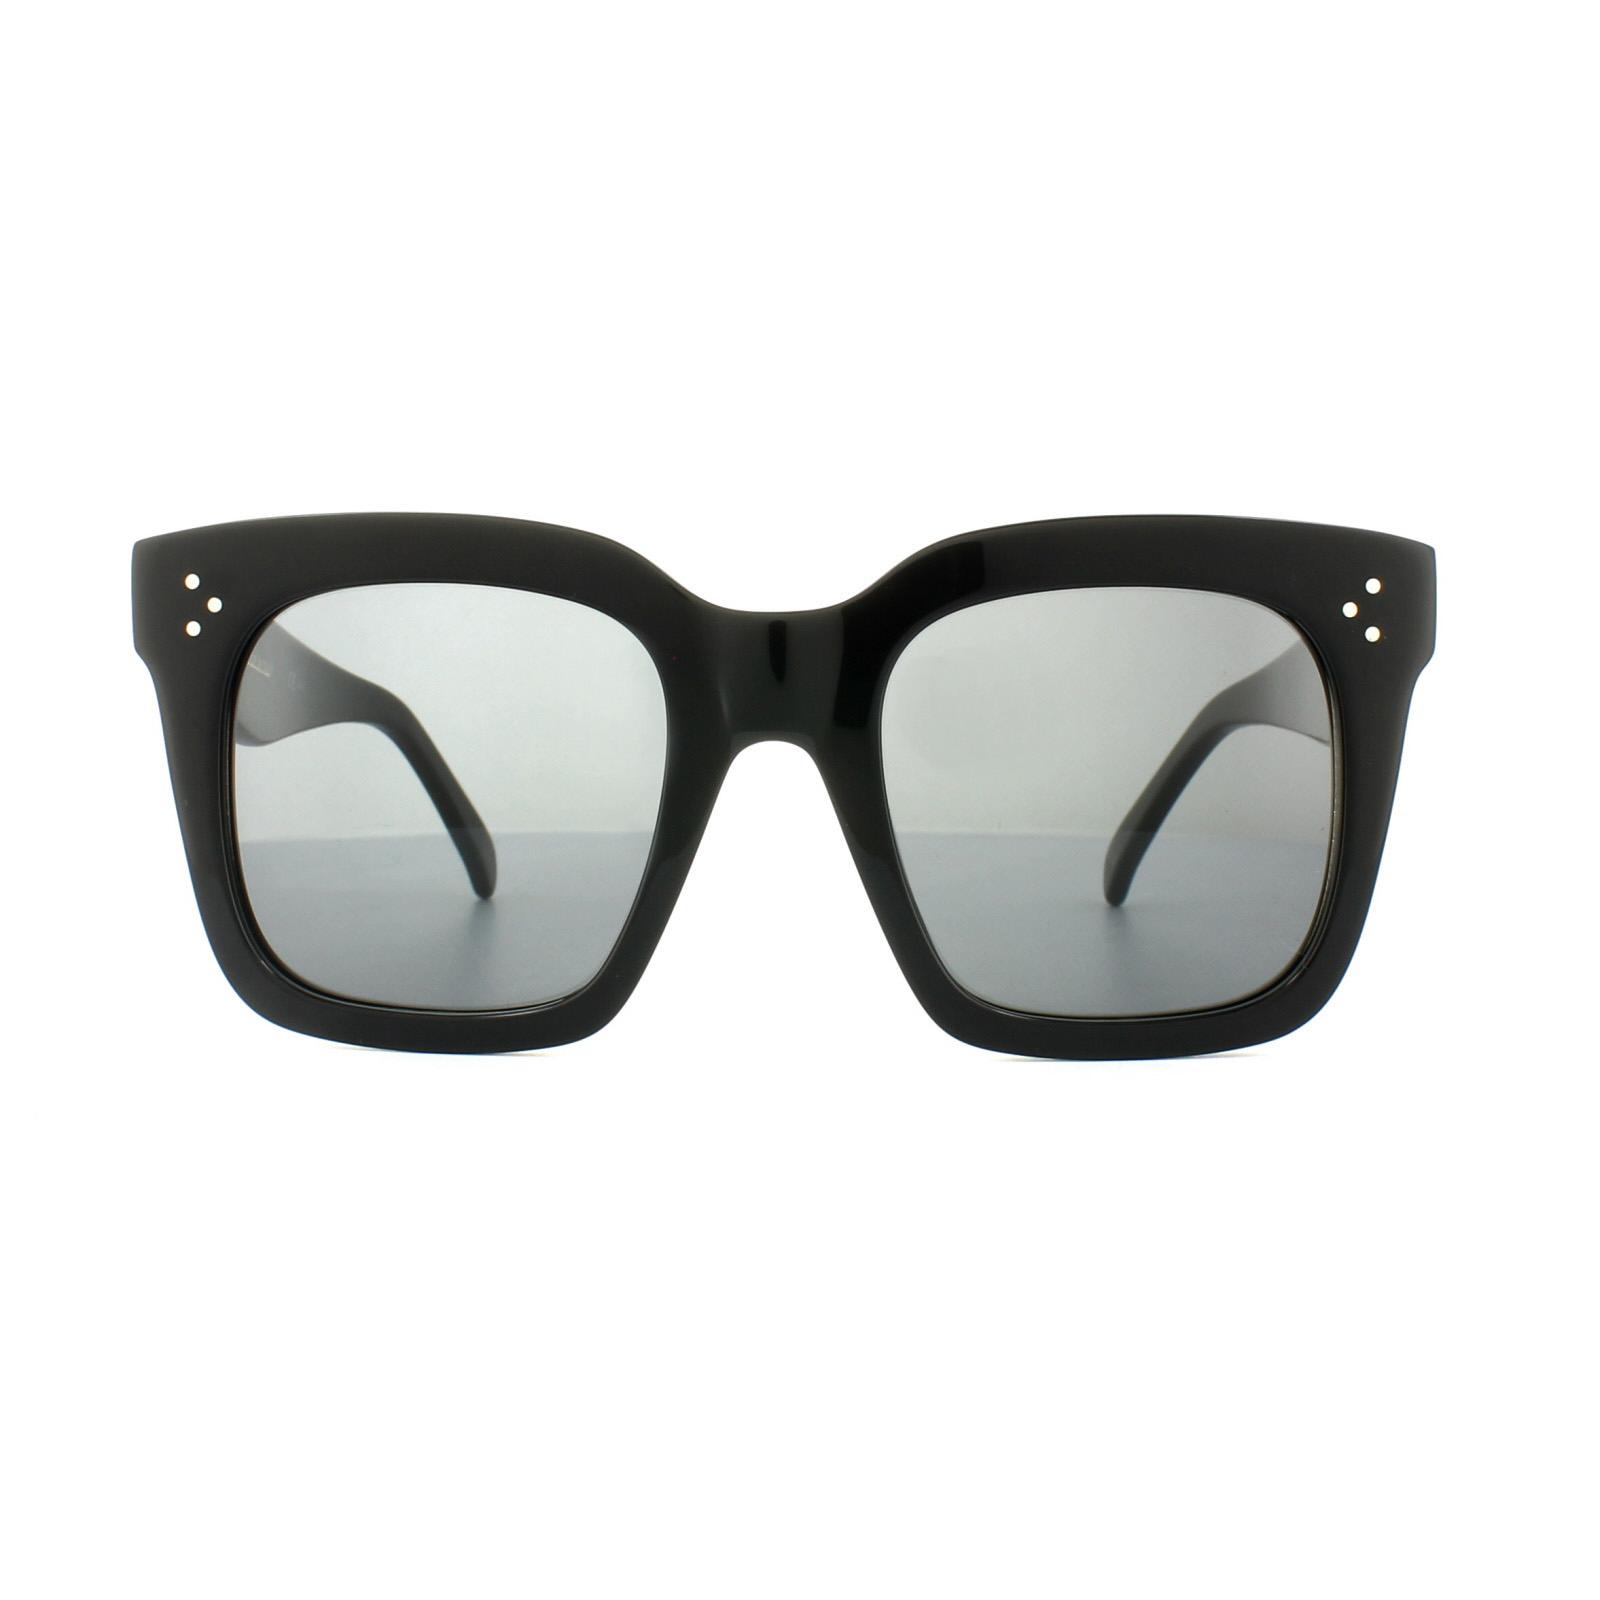 894dbe734d55 ... Celine Sunglasses 41076/S Tilda 807 BN Black Dark Grey Thumbnail 2 ...